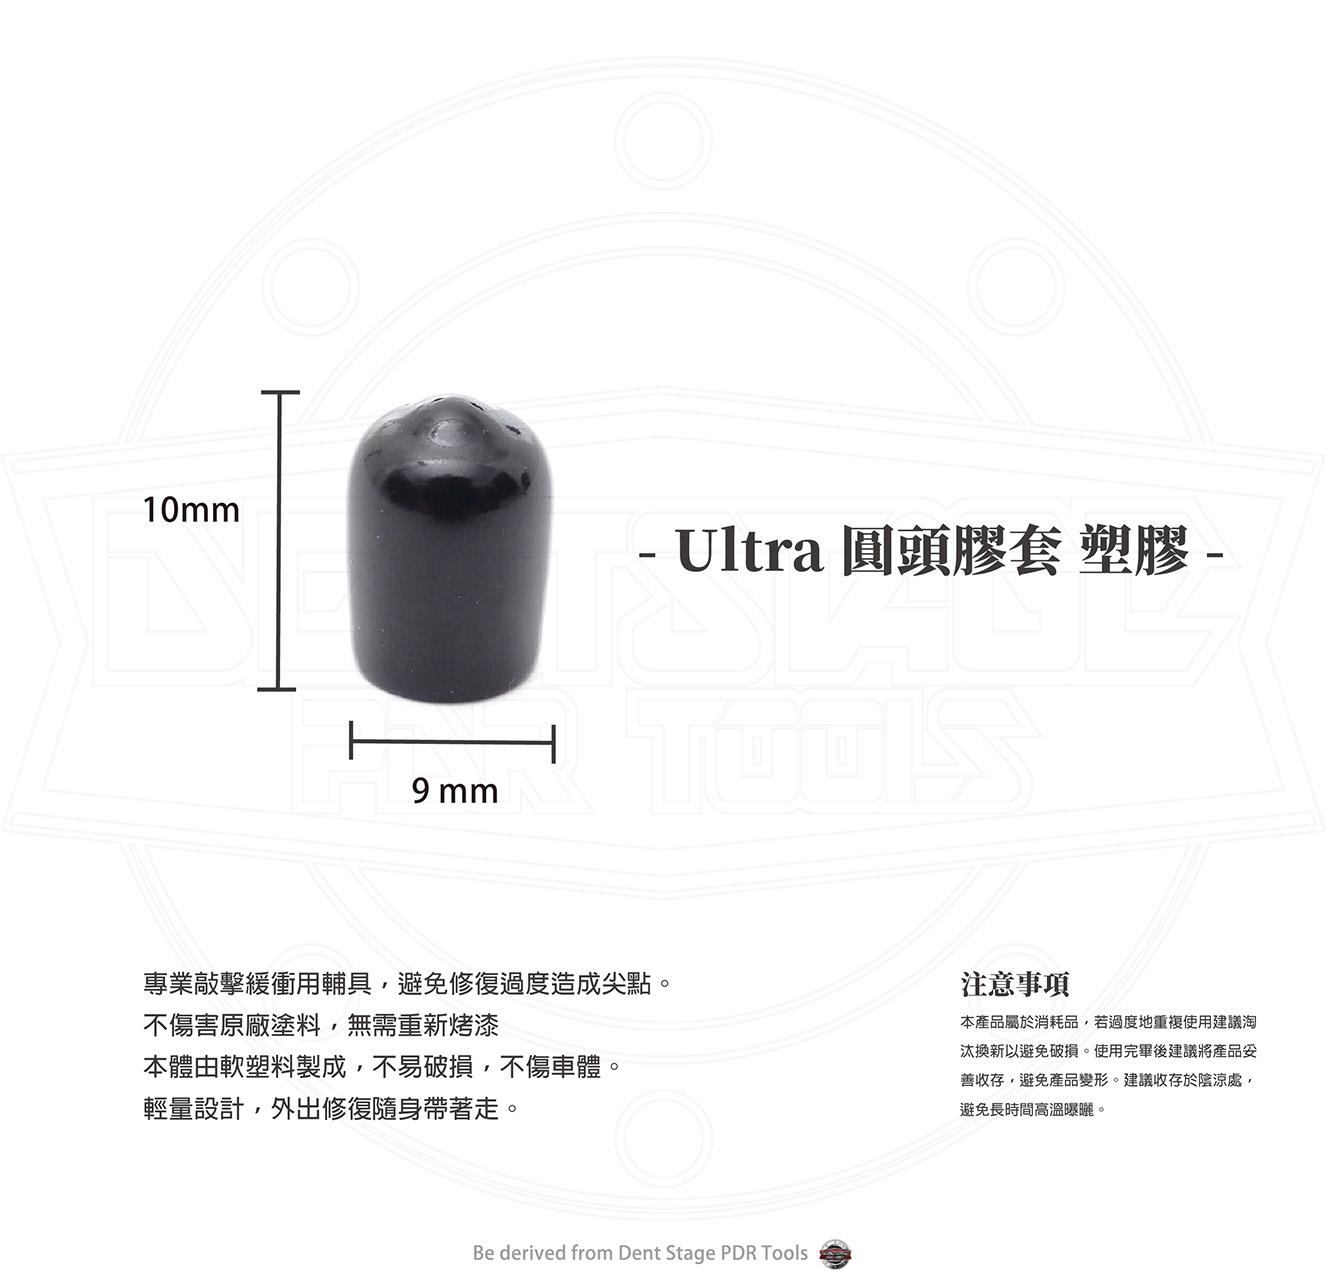 Ultra 圓頭膠套 - 塑膠_02.jpg